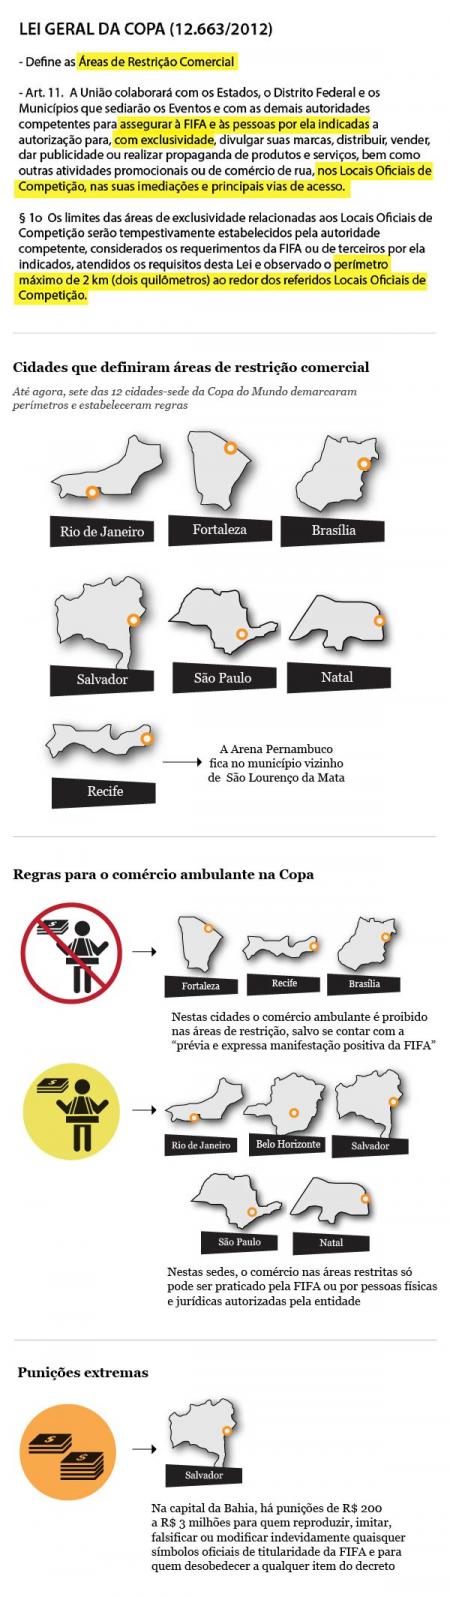 infografico-restricao-comercio-copa